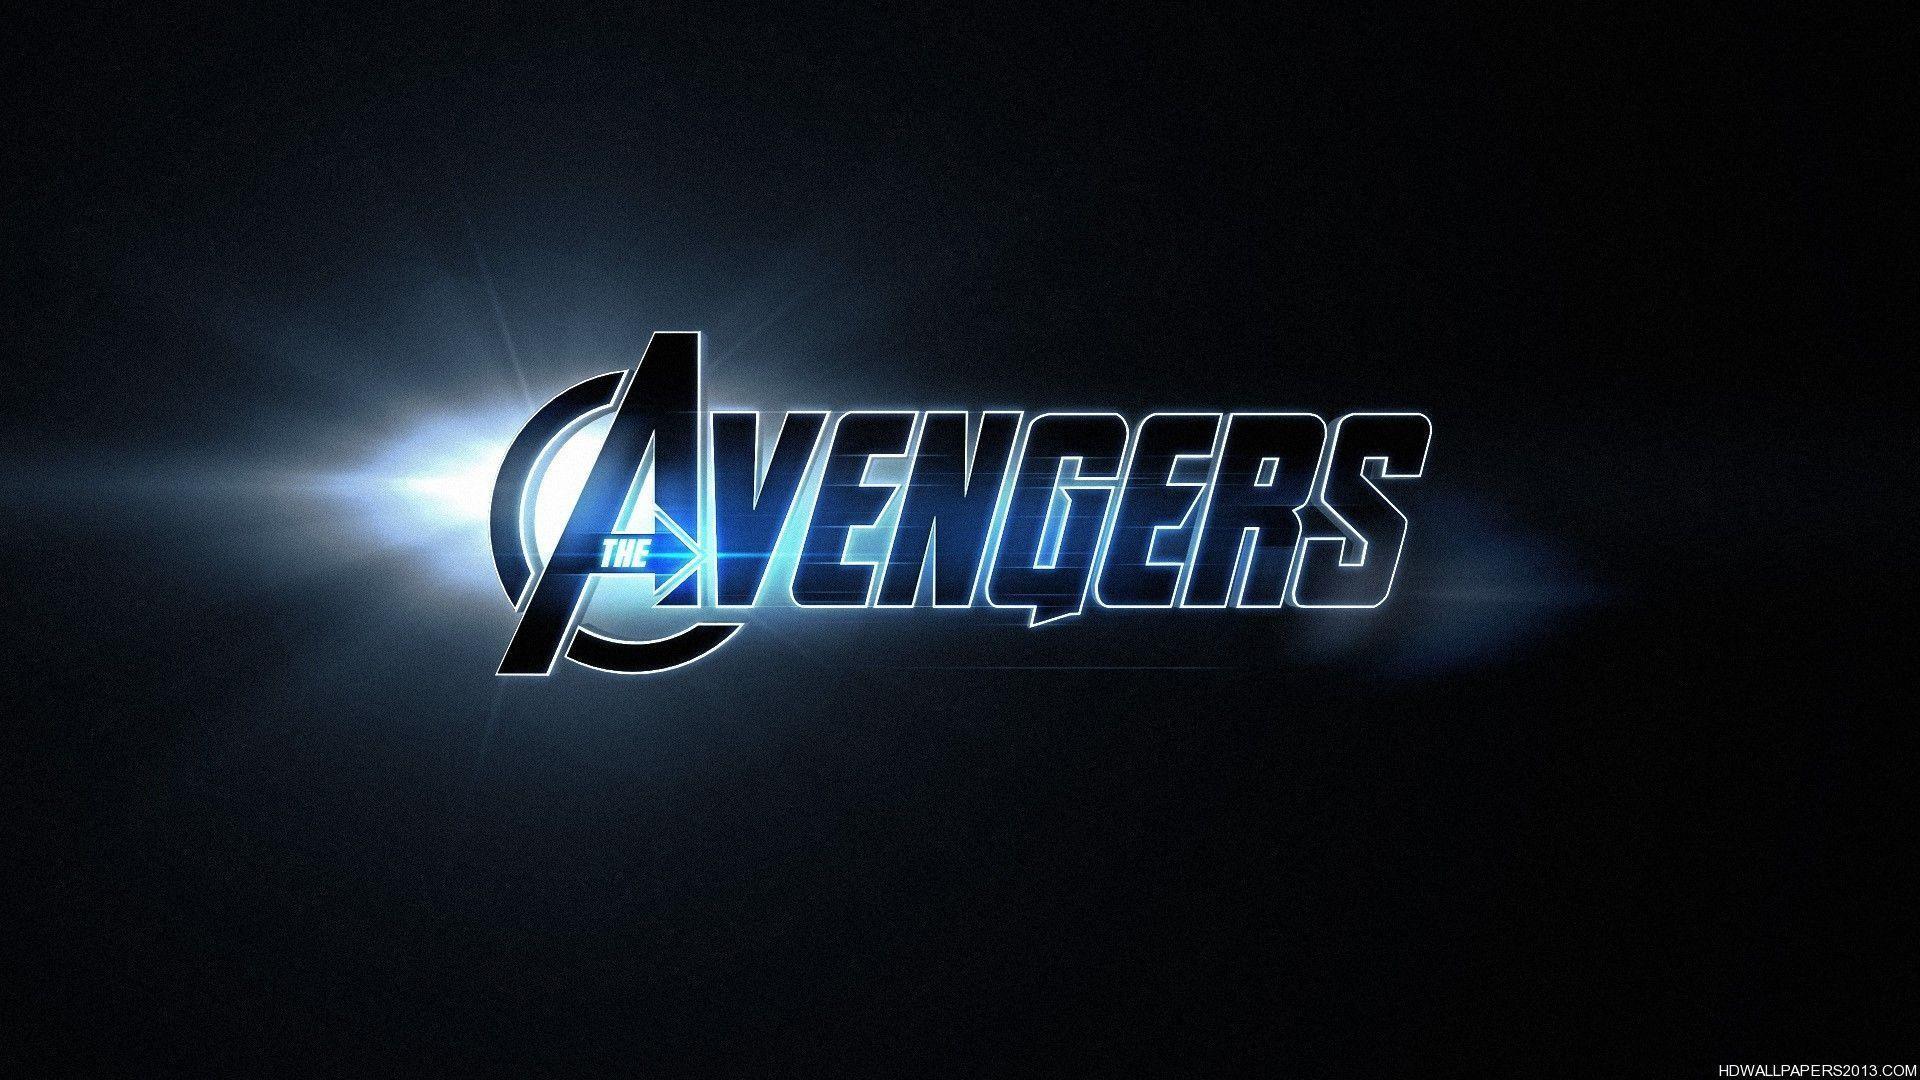 Res: 1920x1080, The Avengers Logo Wallpaper wallpaper - 1011284